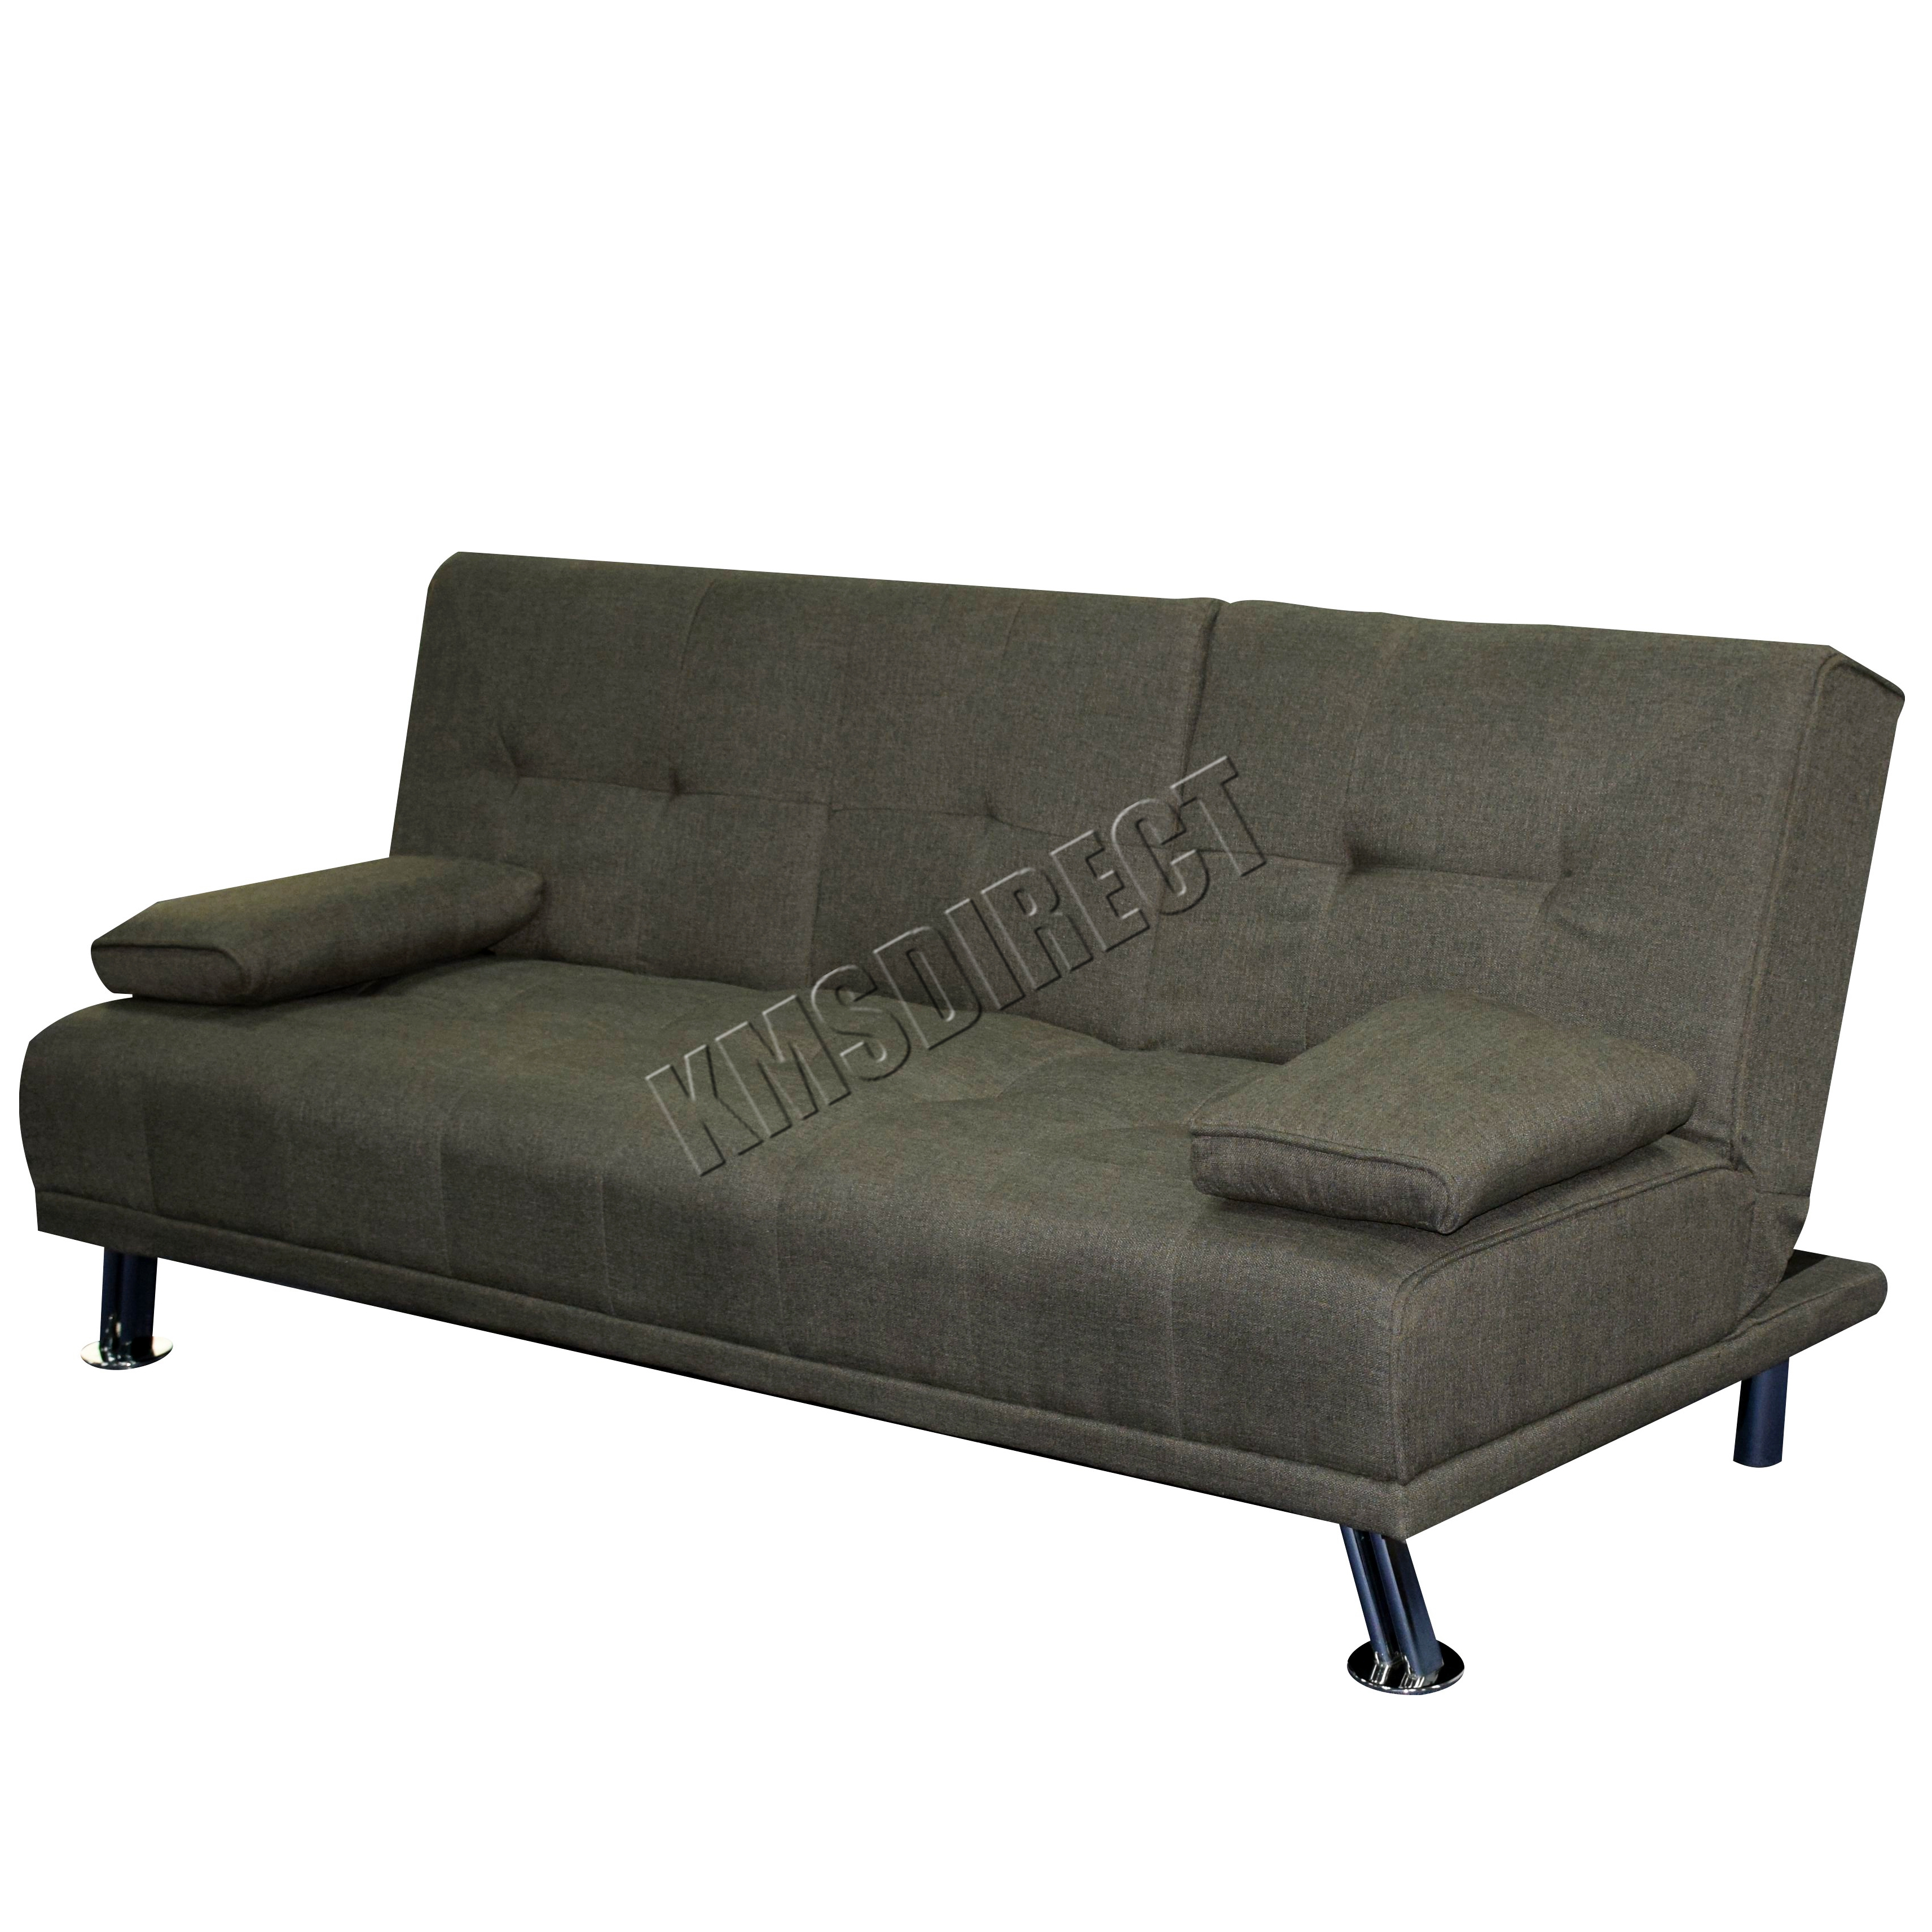 Sofa agreements uk mjob blog for Sofa bed germany